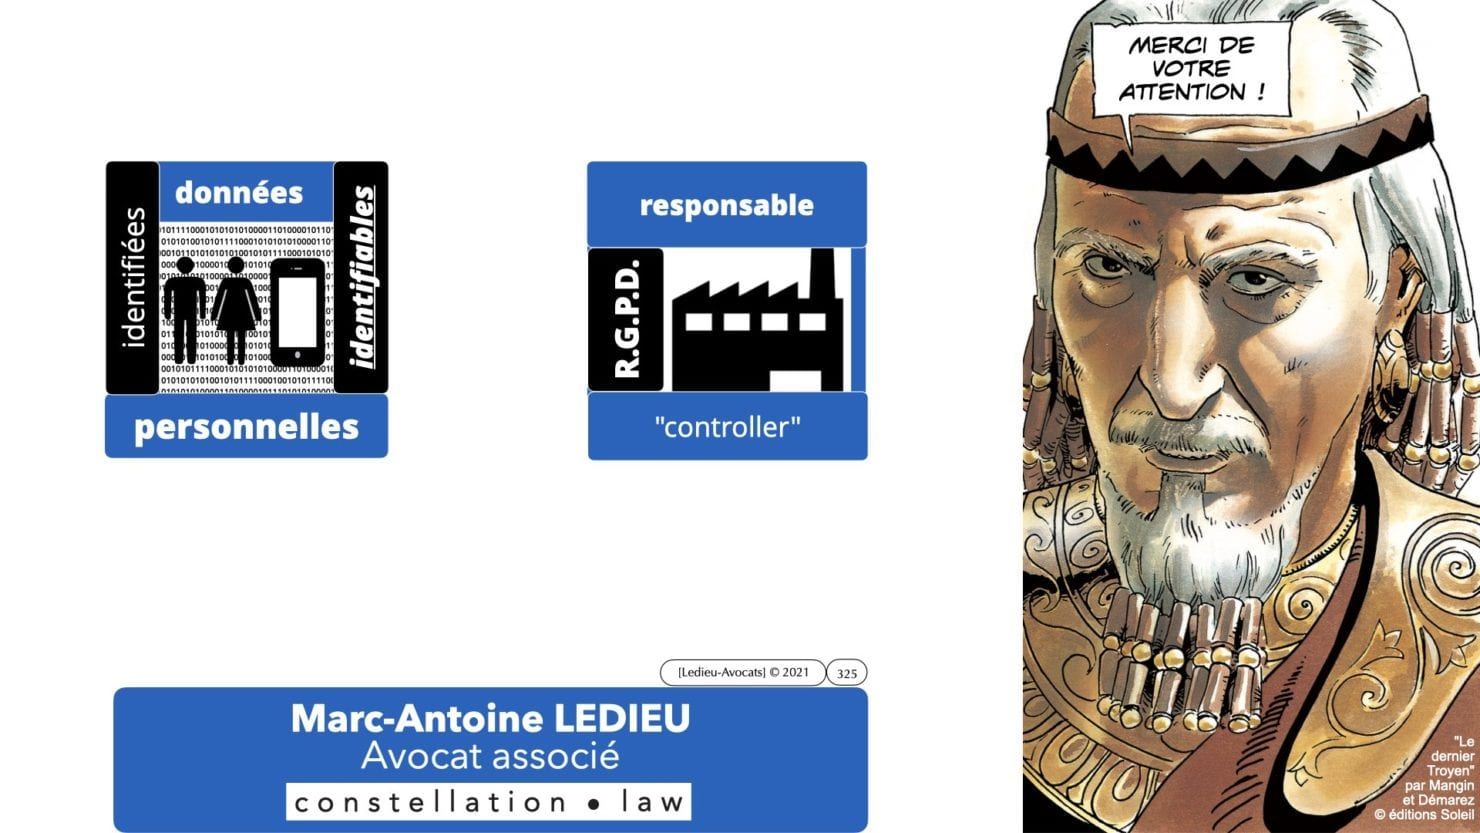 RGPD e-Privacy principes actualité jurisprudence ©Ledieu-Avocats 25-06-2021.325